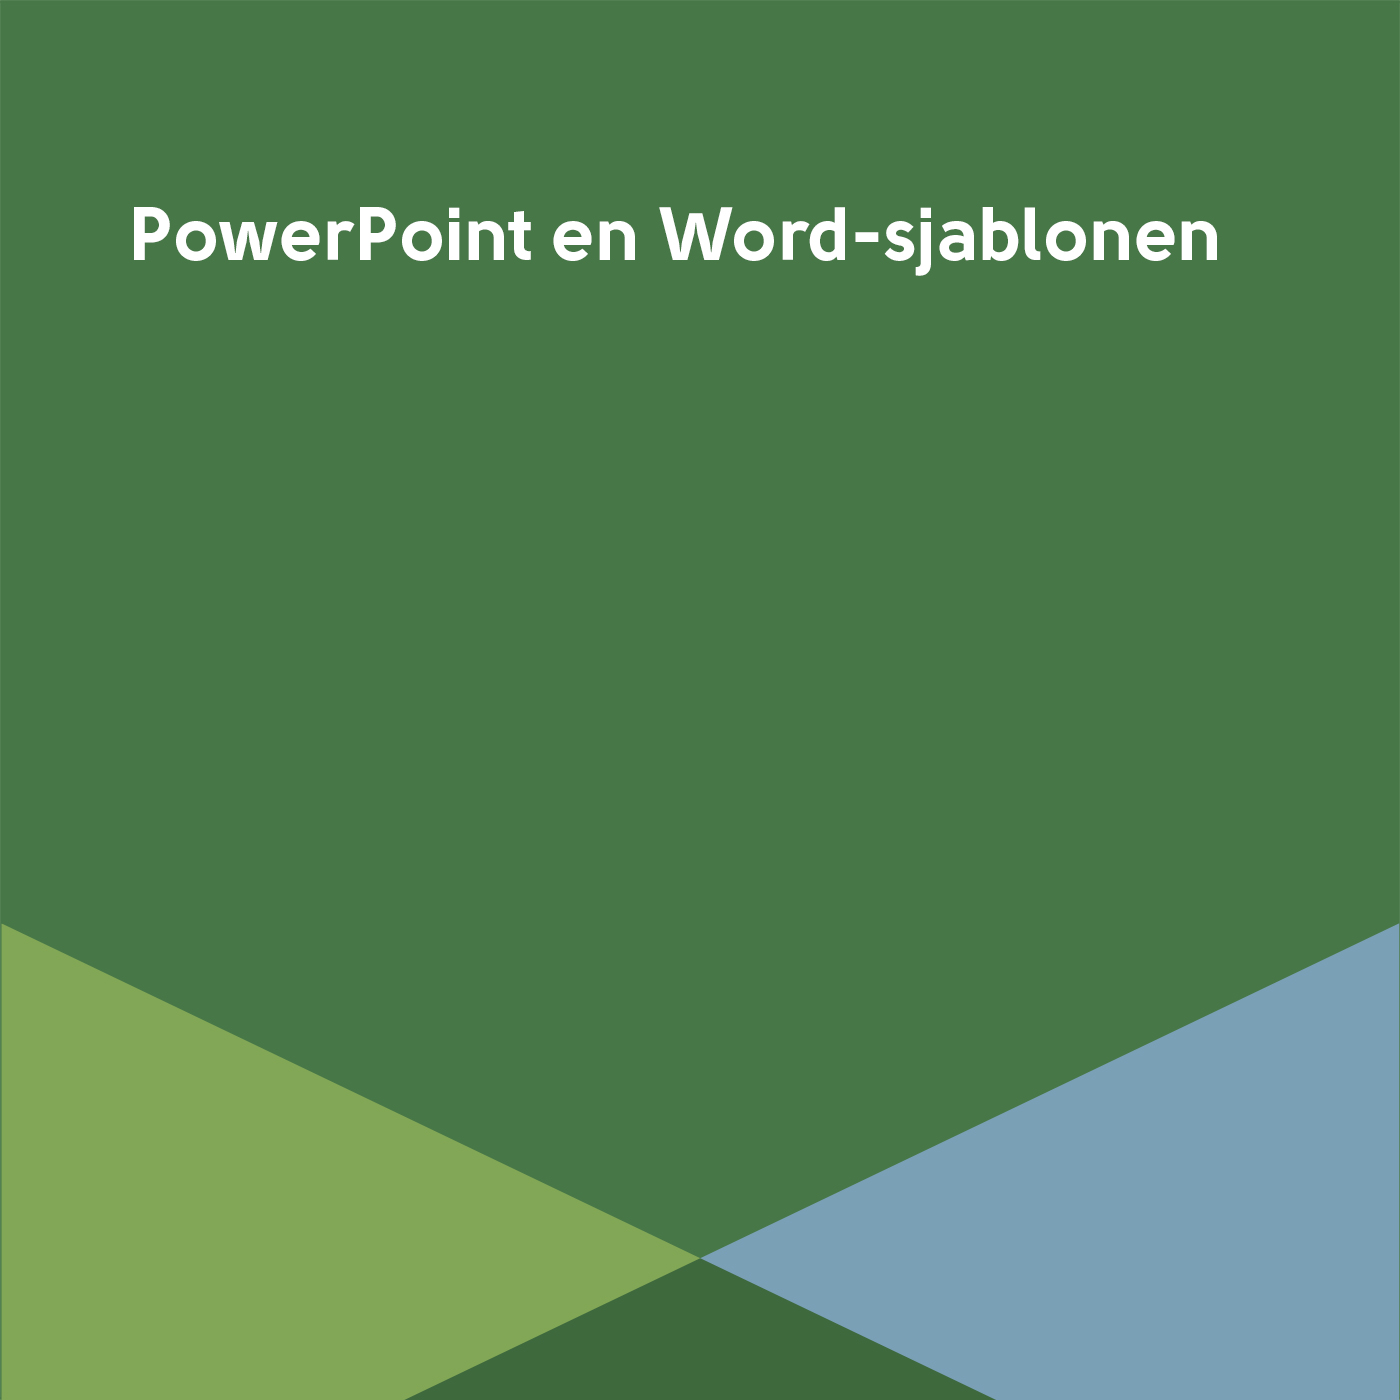 PowerPoint en Word-sjablonen